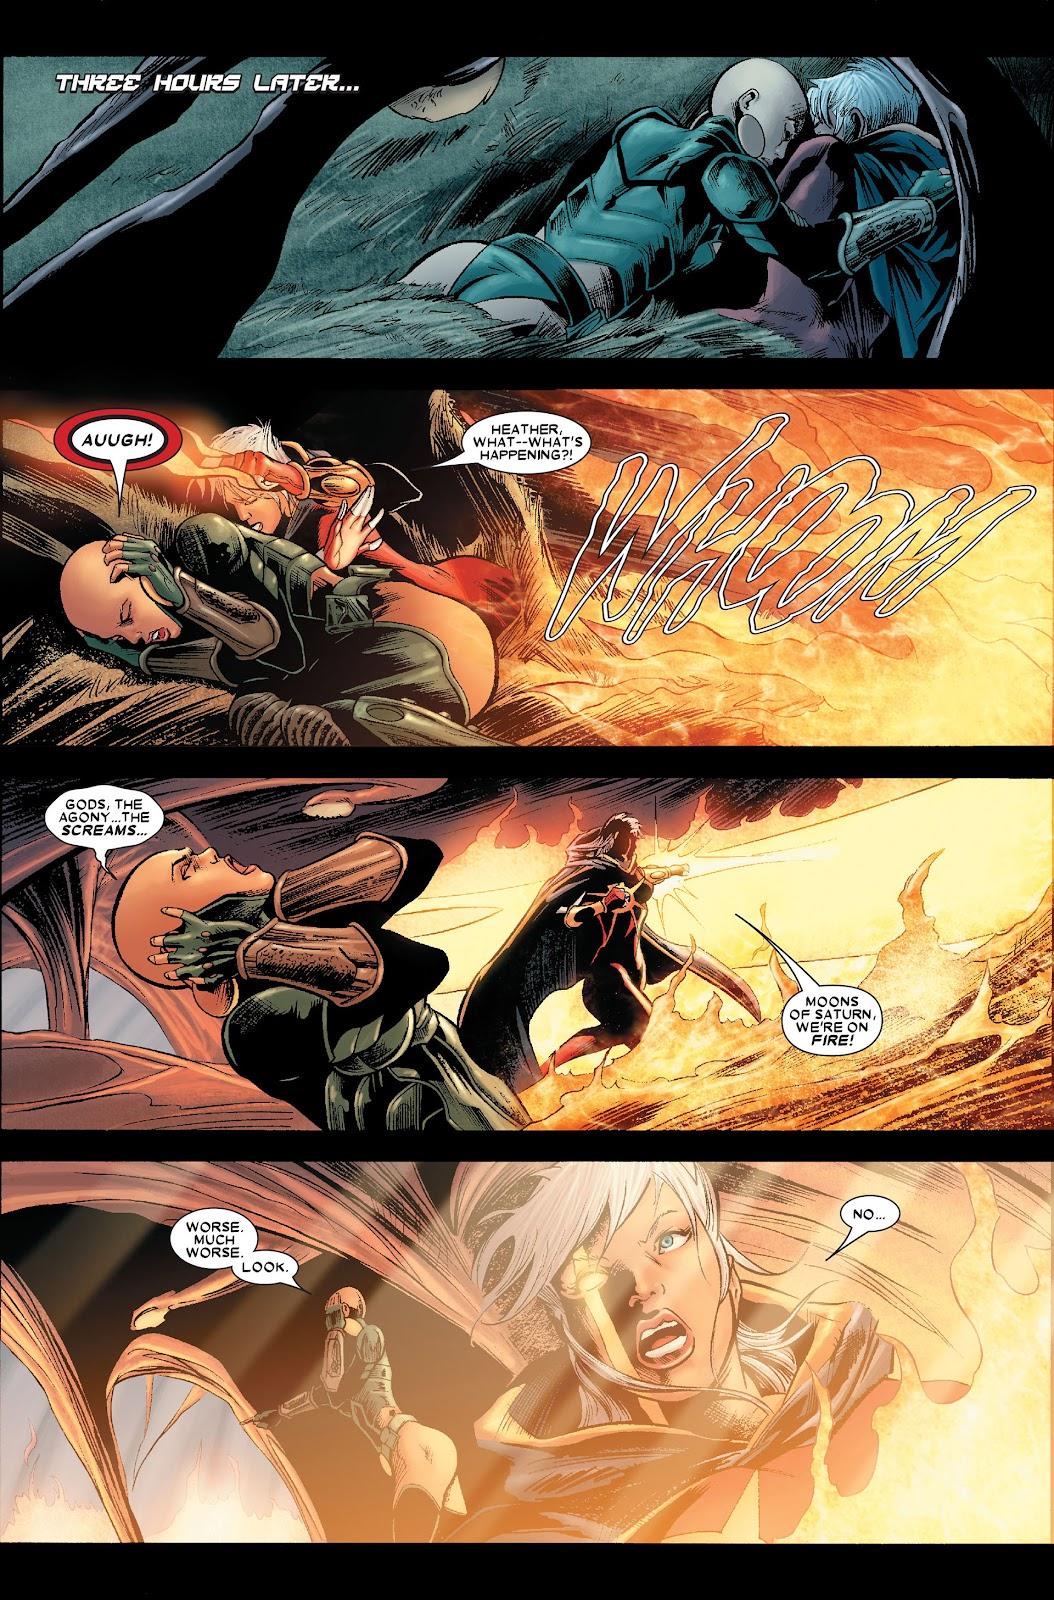 Annihilation: Conquest - Quasar issue 1 - Page 18